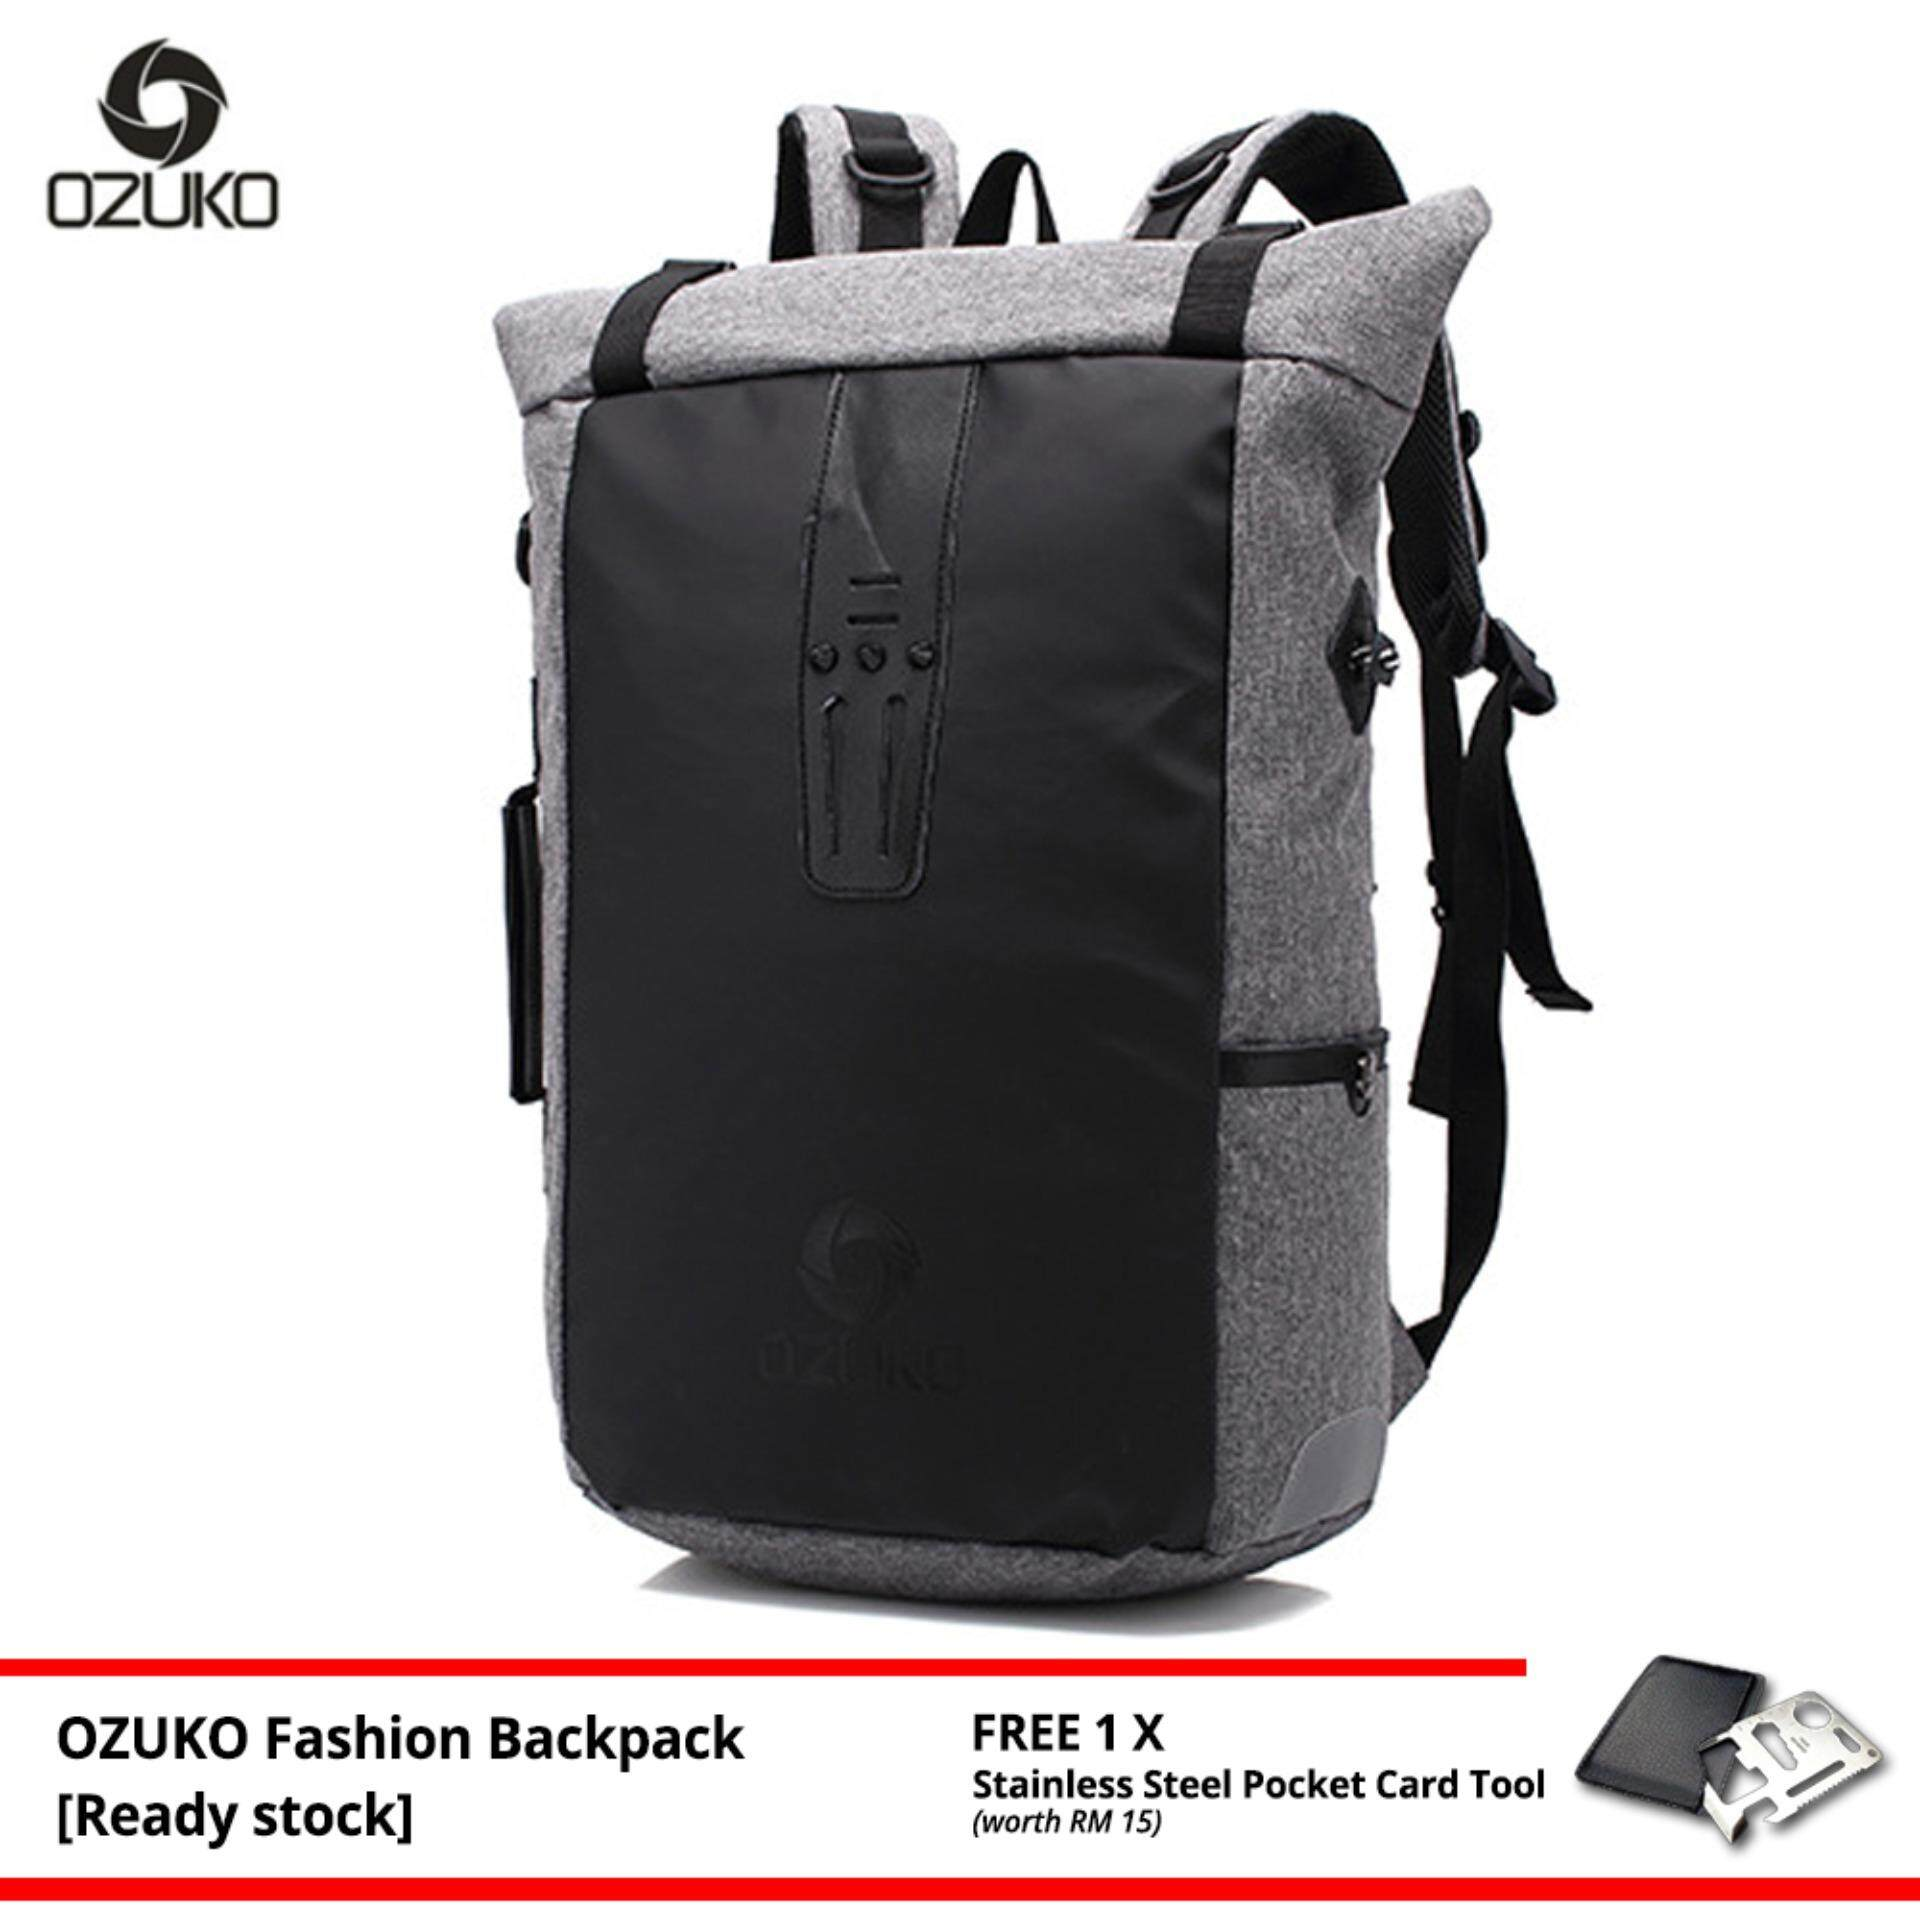 OZUKO Brand New Backpack Fashion Laptop Bag Casual Waterproof Travel Korean Style Hand Carry Men Women Bagpack -MI4462